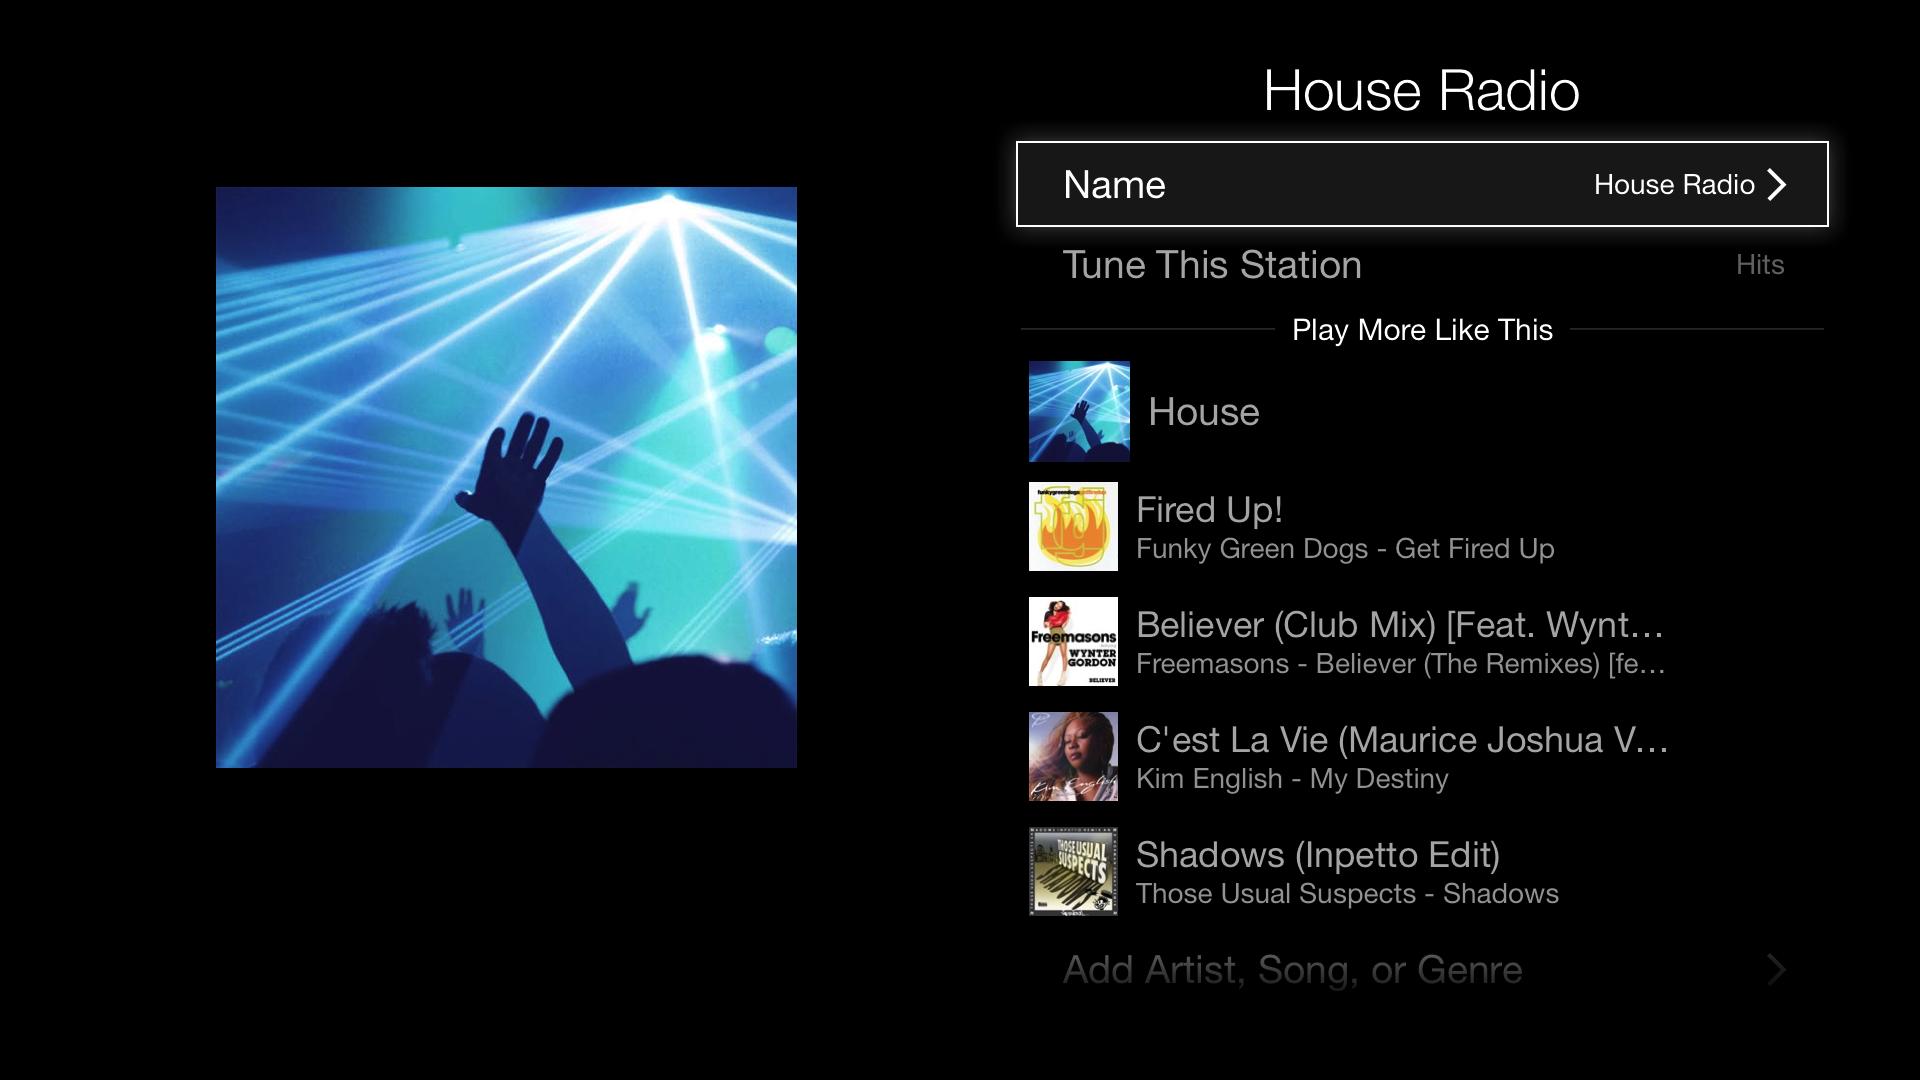 House radio station on iTunes Radio